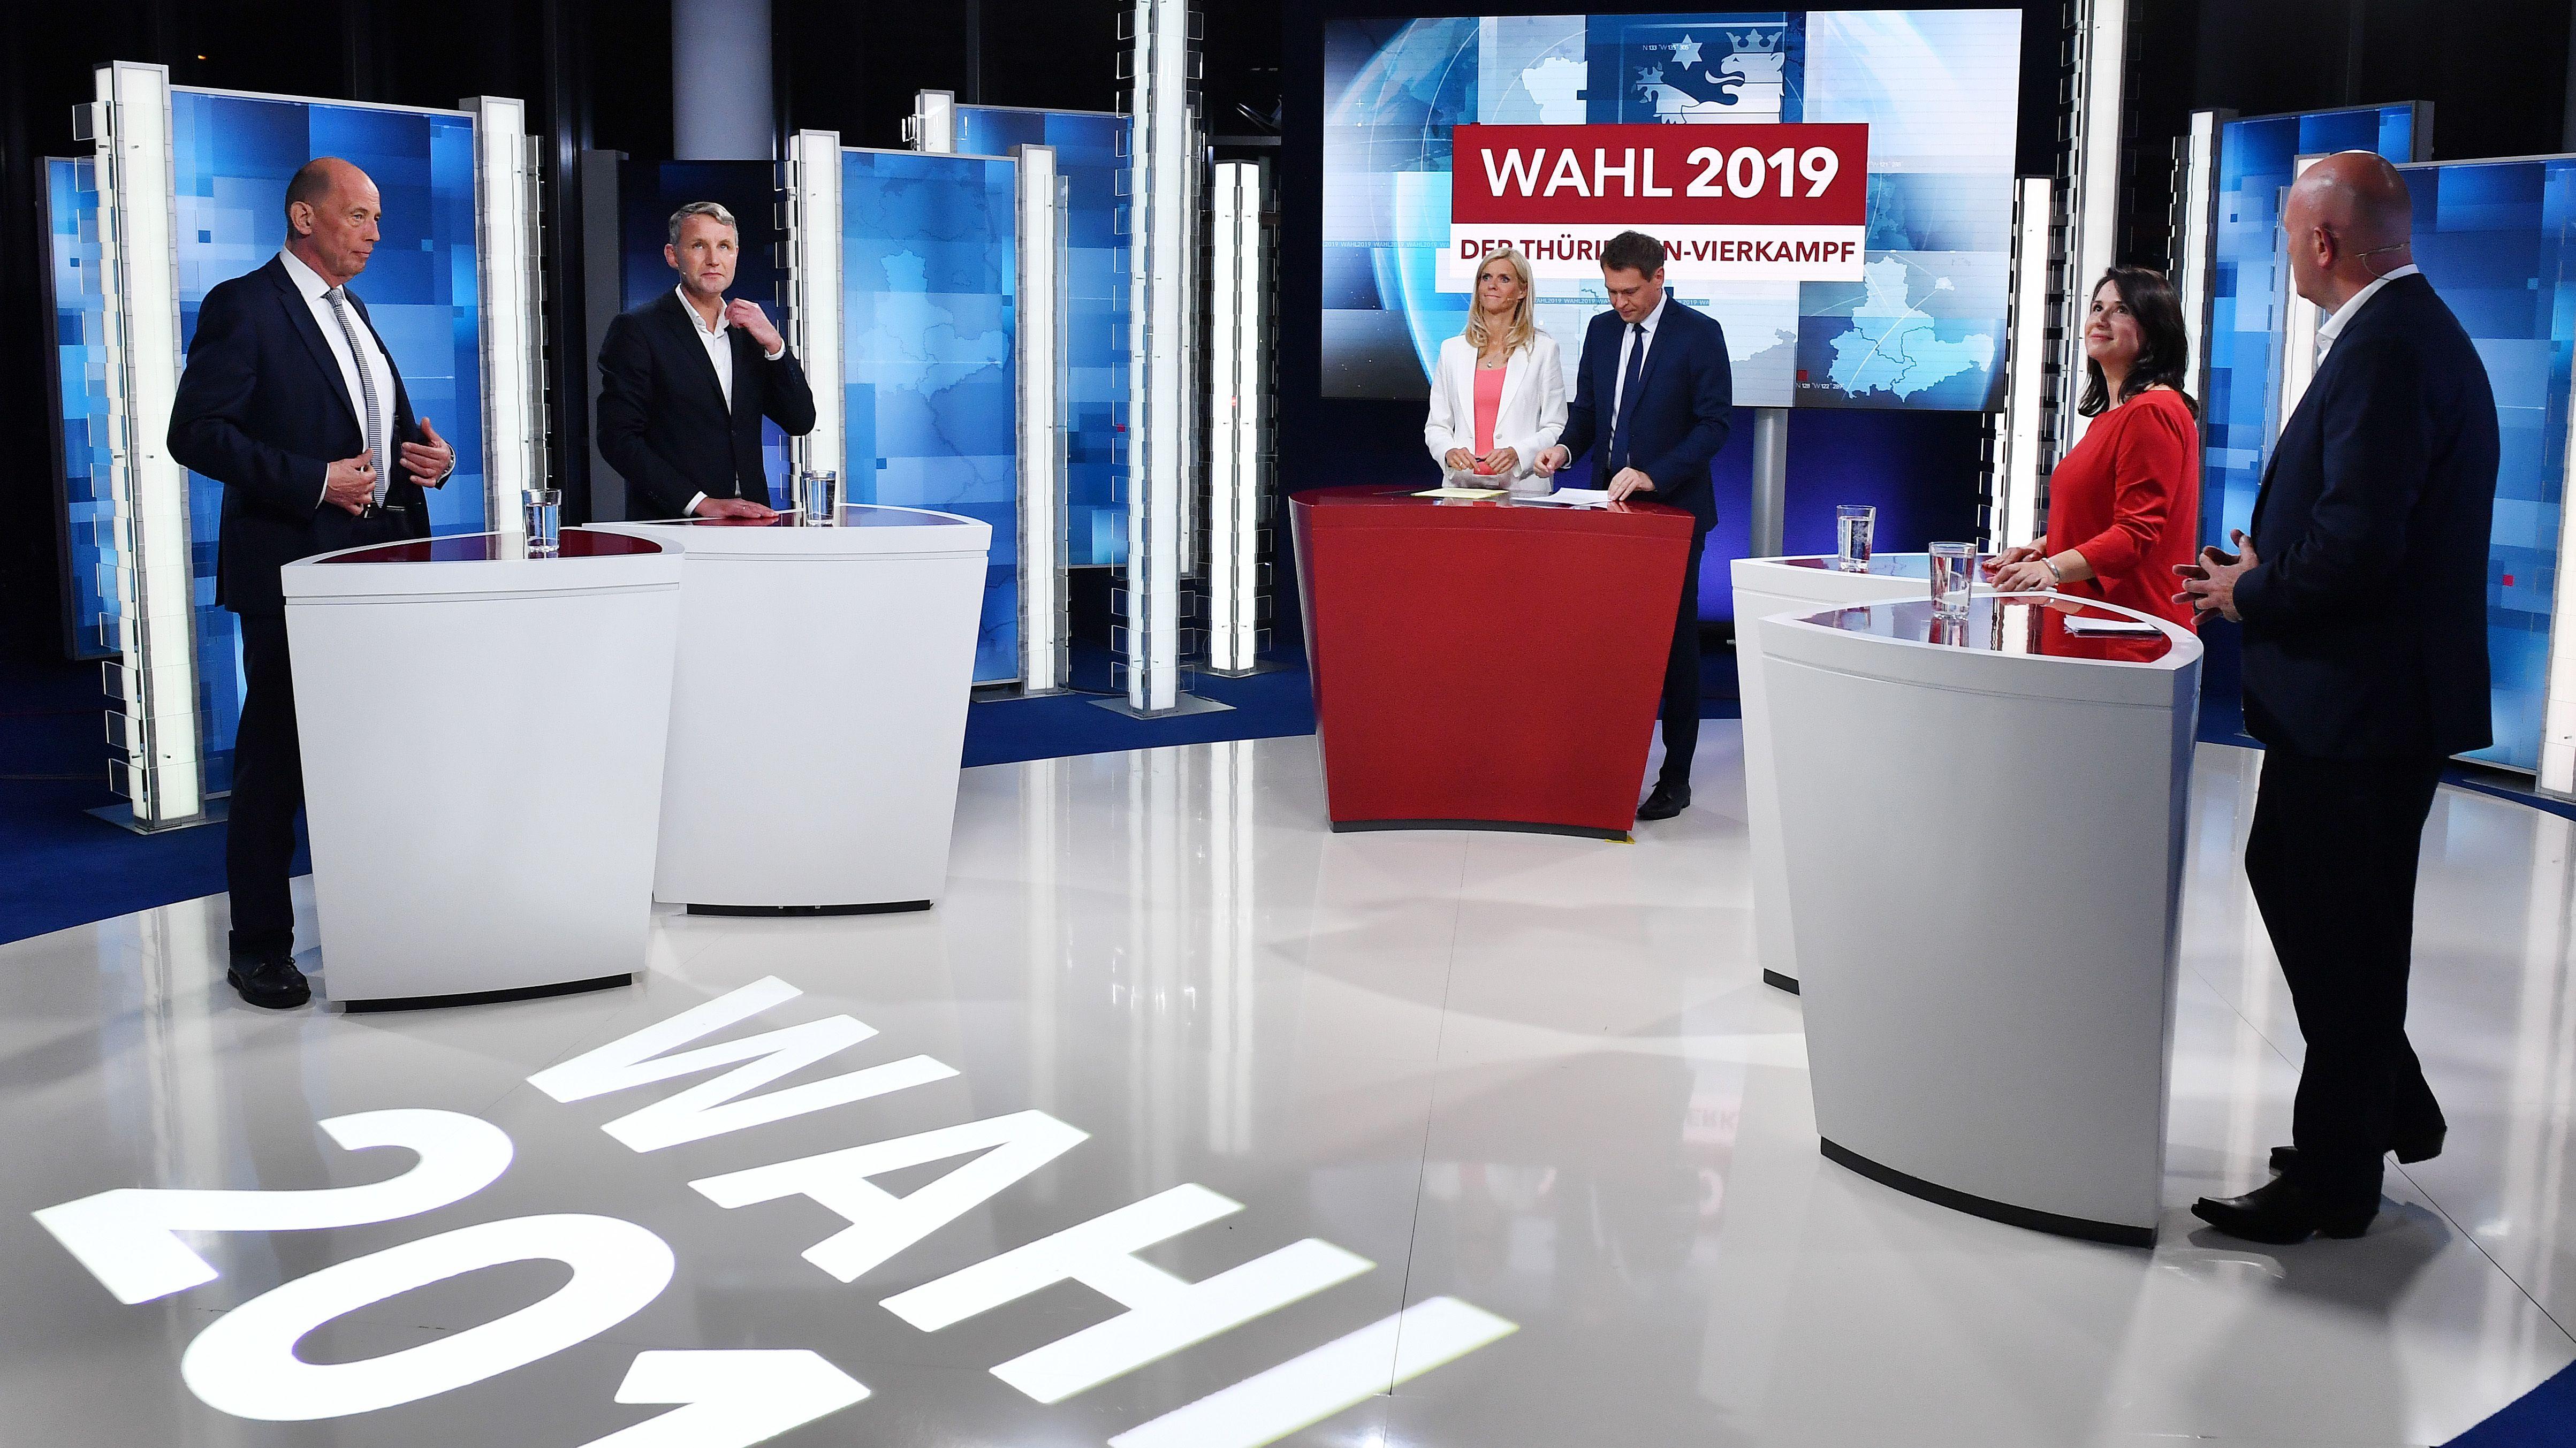 TV-Duell zur Landtagswahl Thüringen